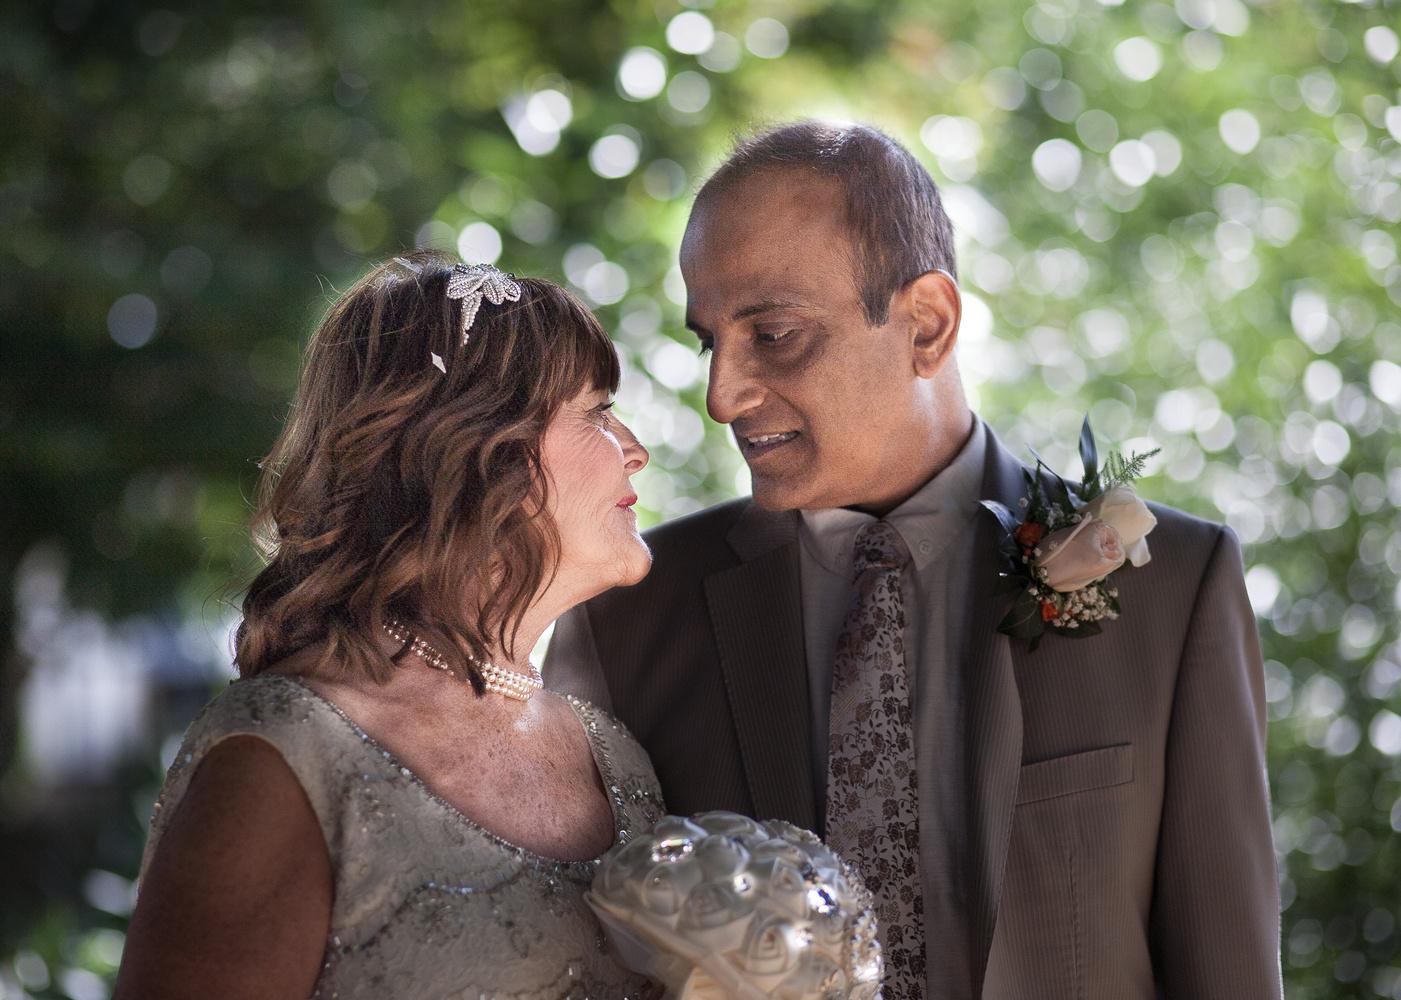 Southend wedding photography by Taz Rahman